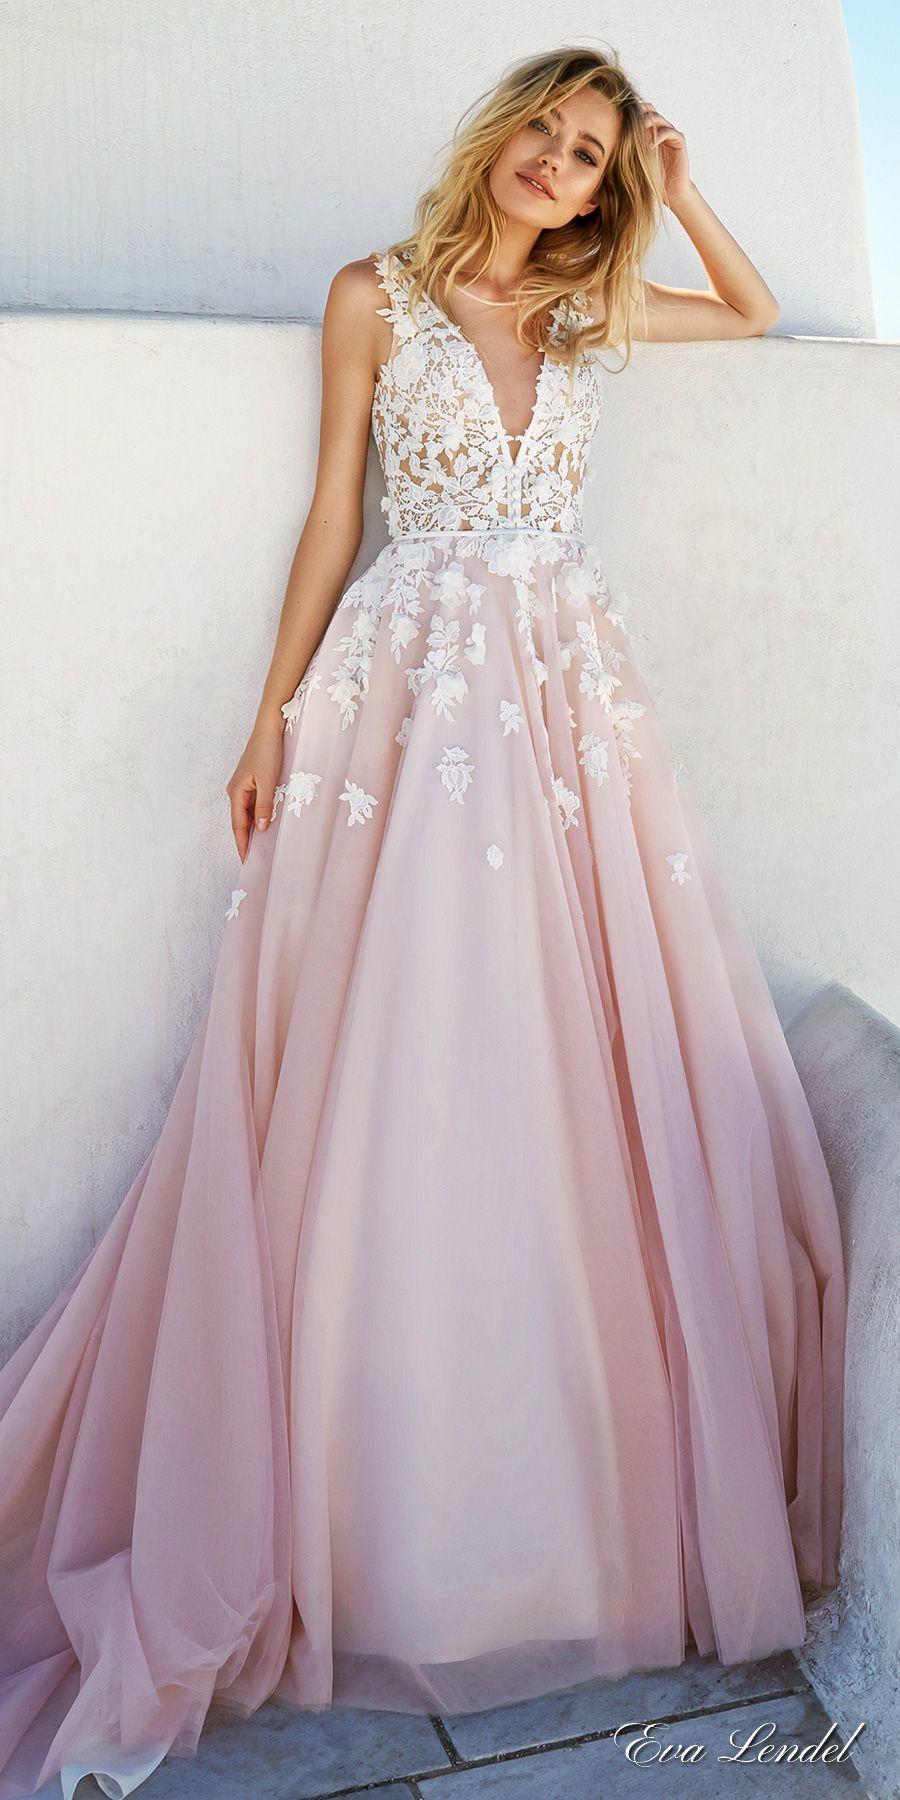 ef87eee201a5111d066bf1a7ba9e3955 - 15 schöne rosa Brautkleider